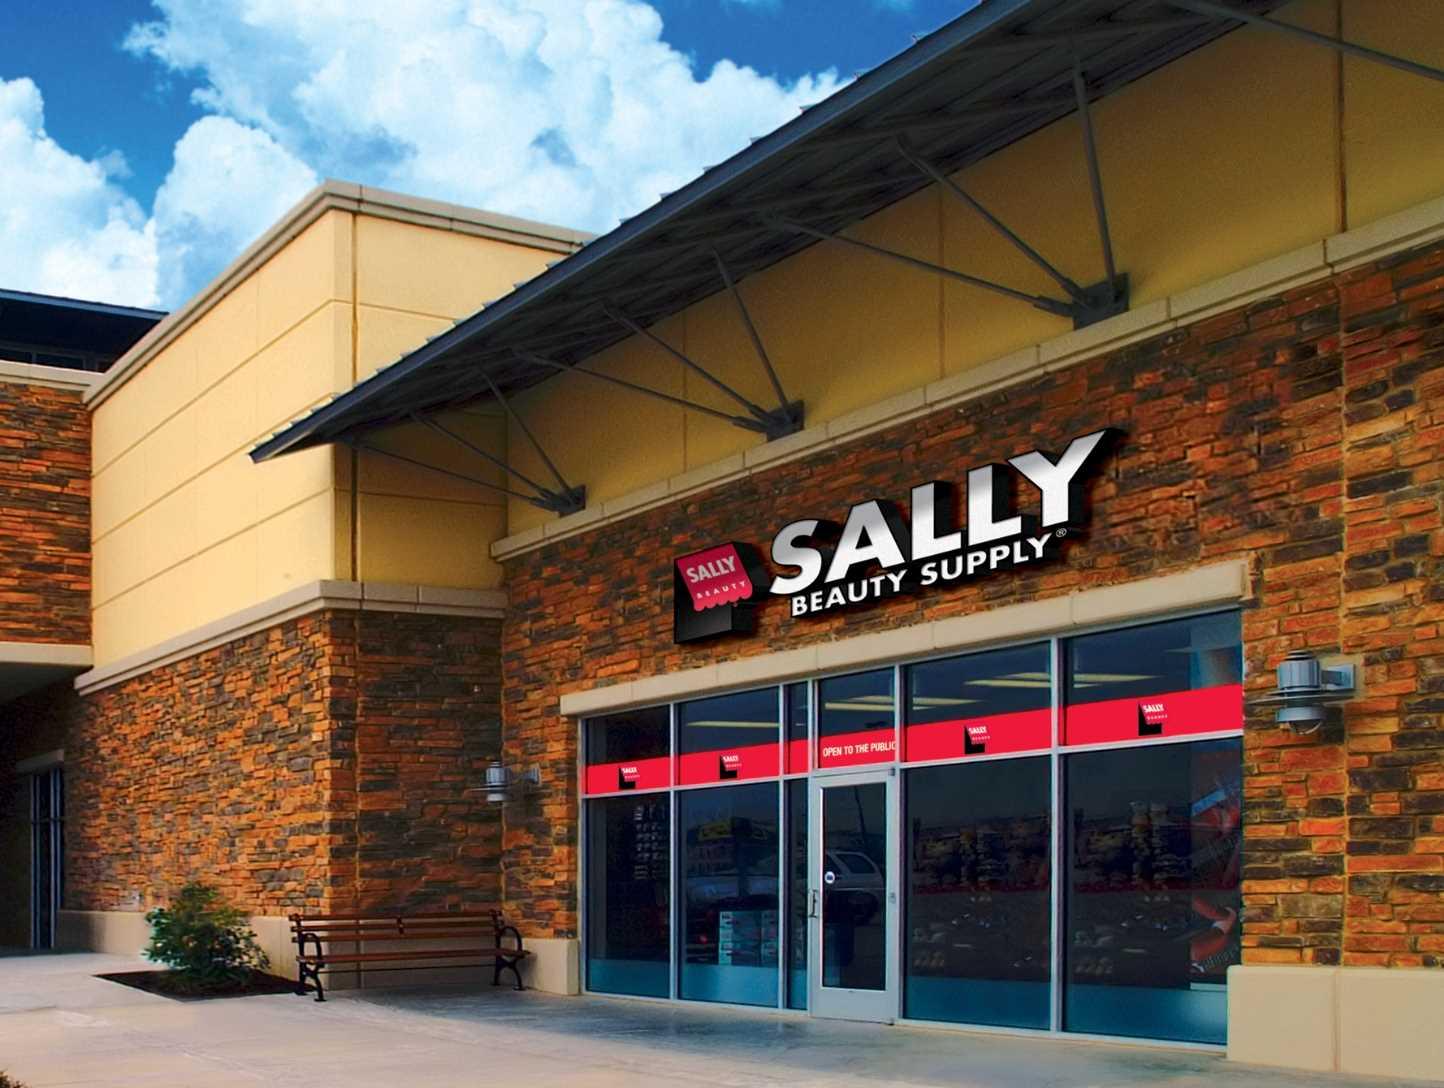 Sally Beauty confirms data breach